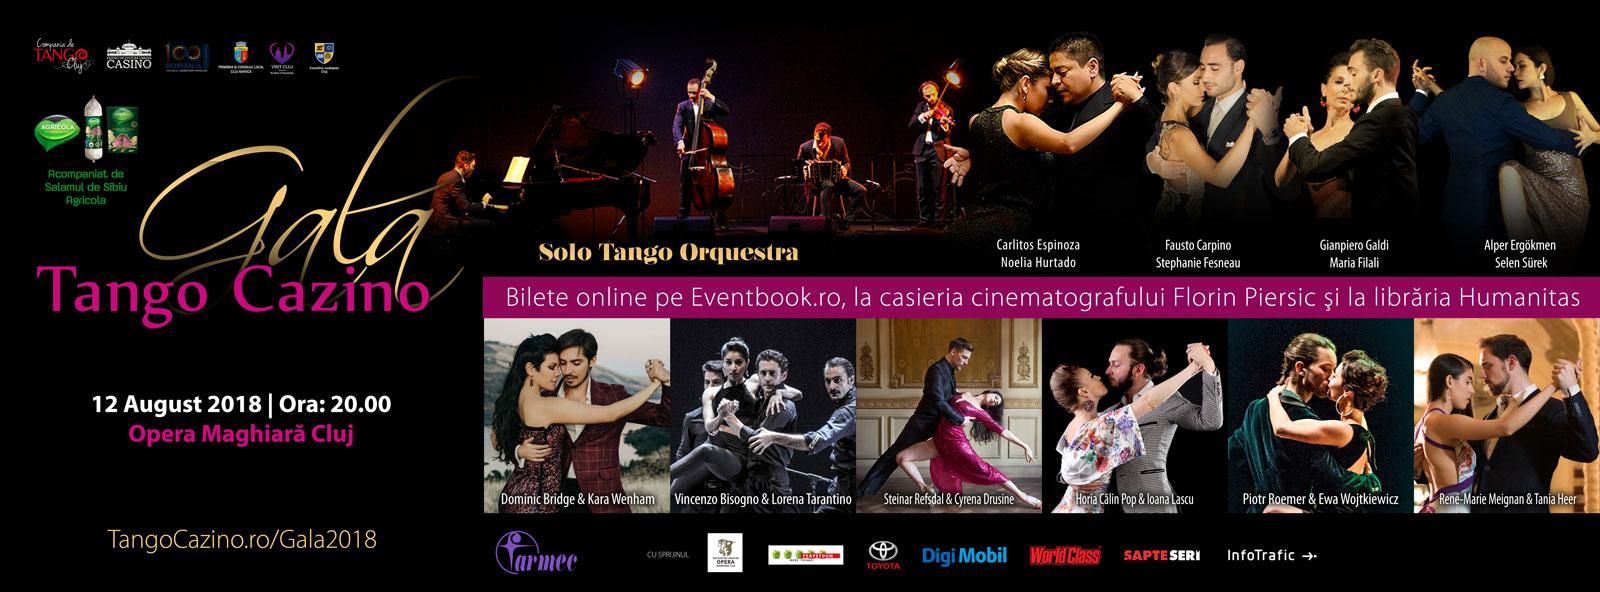 cover-gala-tango-2018